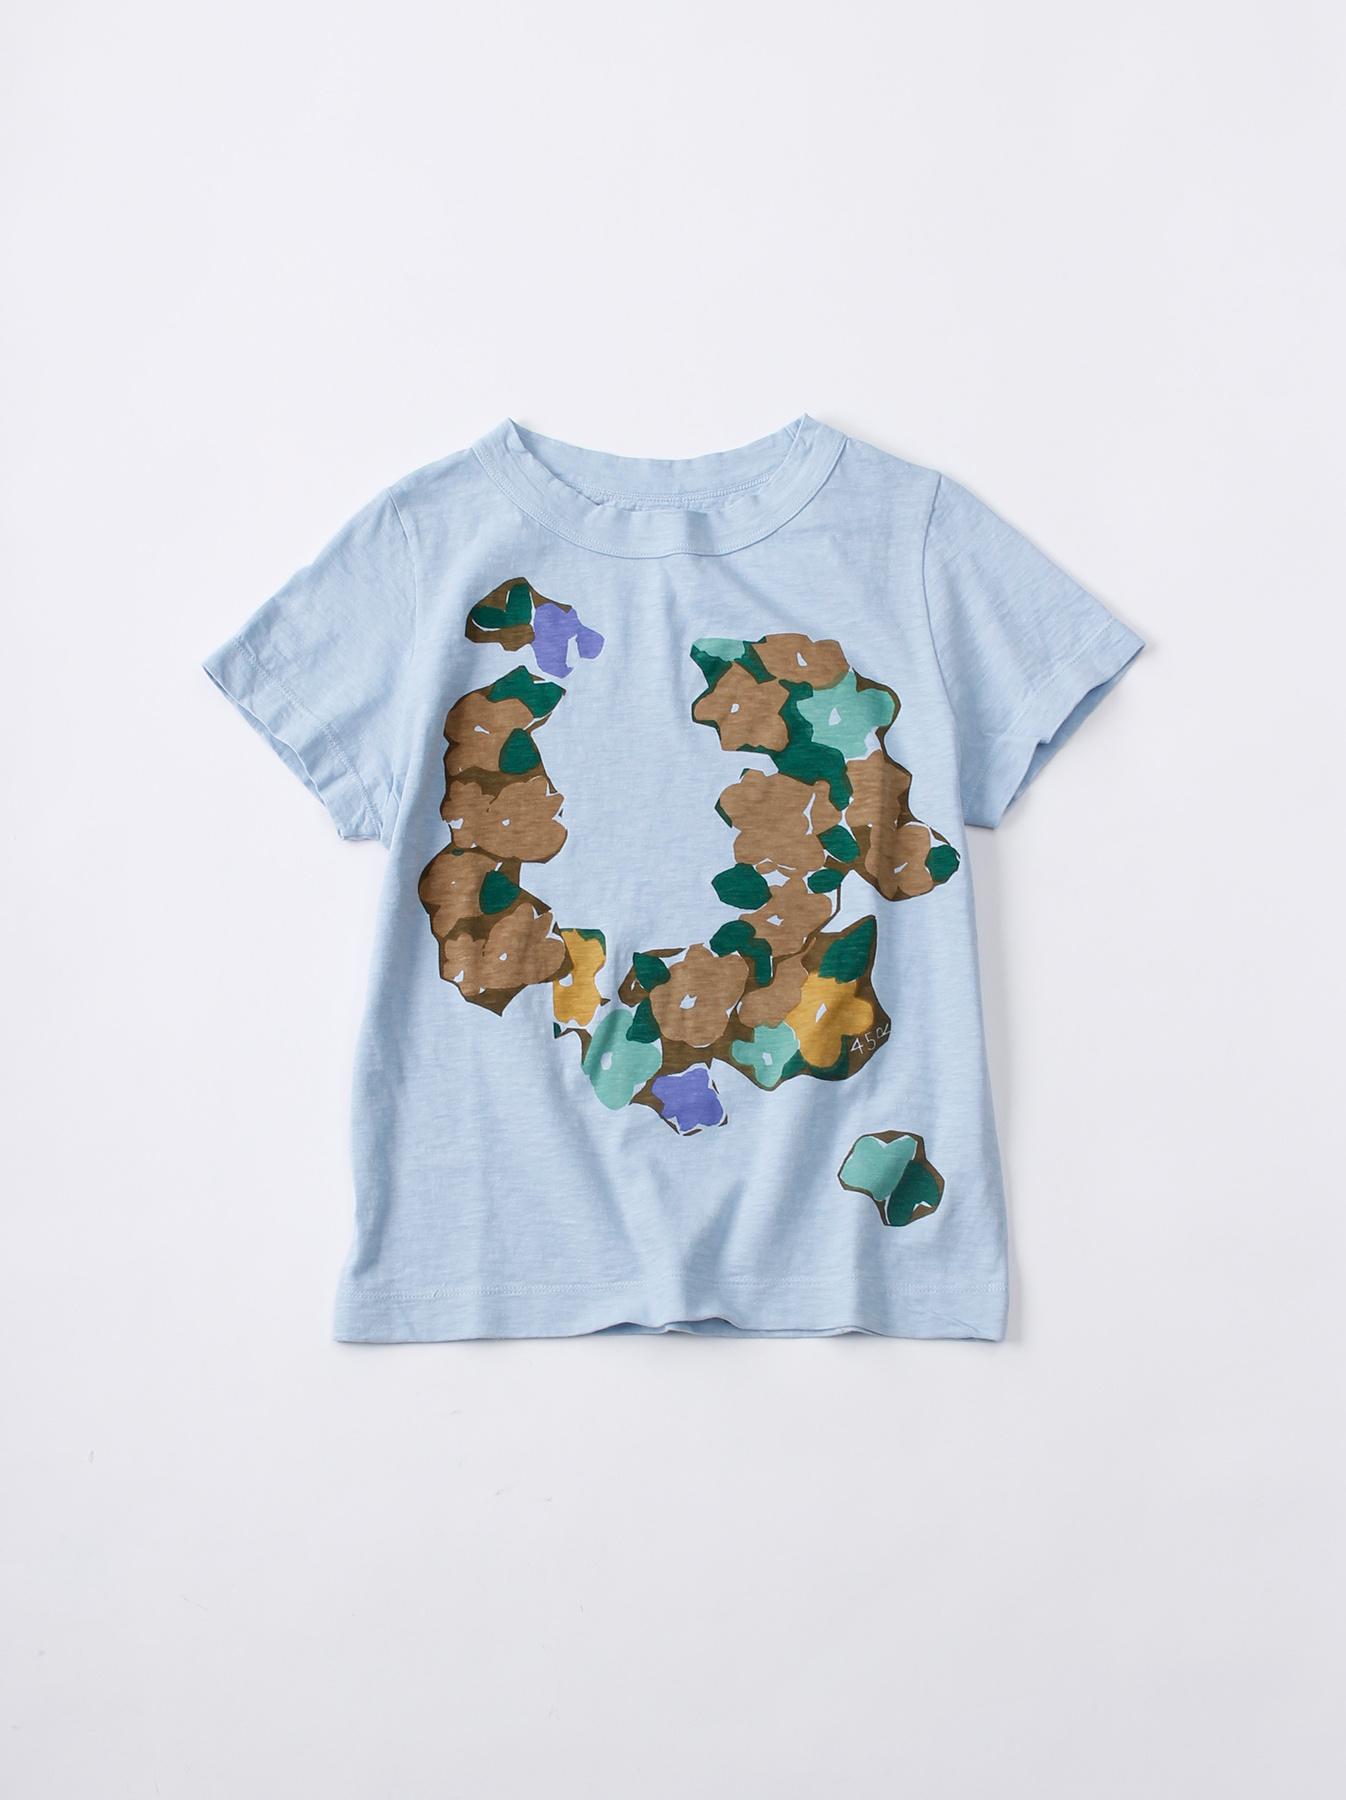 WH 45 Star T-shirt (Flower)-6